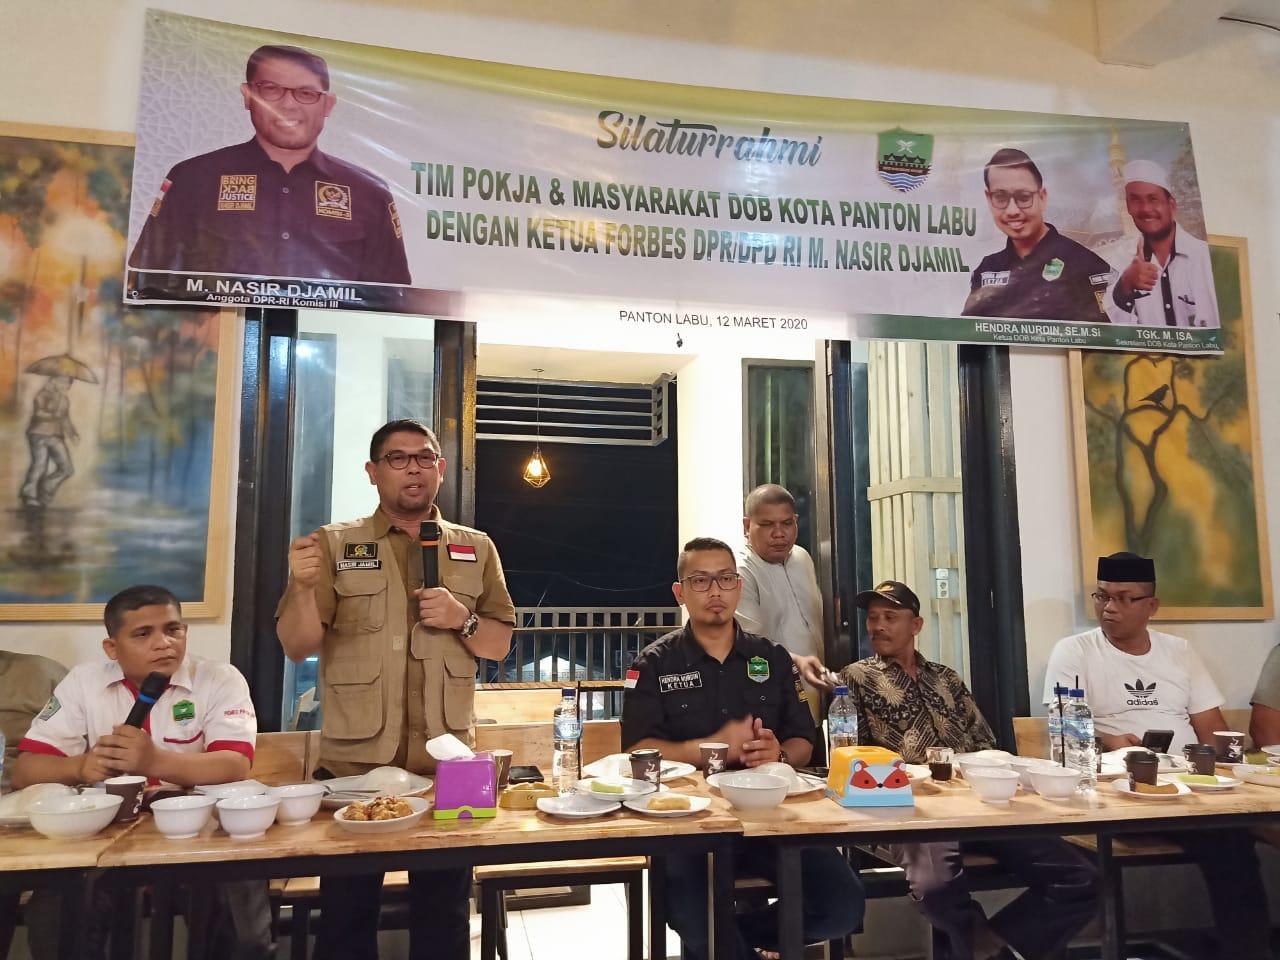 Tim Pokja dan Masyarakat DOB Kota Panton Labu Silaturrahmi Dengan Ketua FORBES DPR/DPD RI